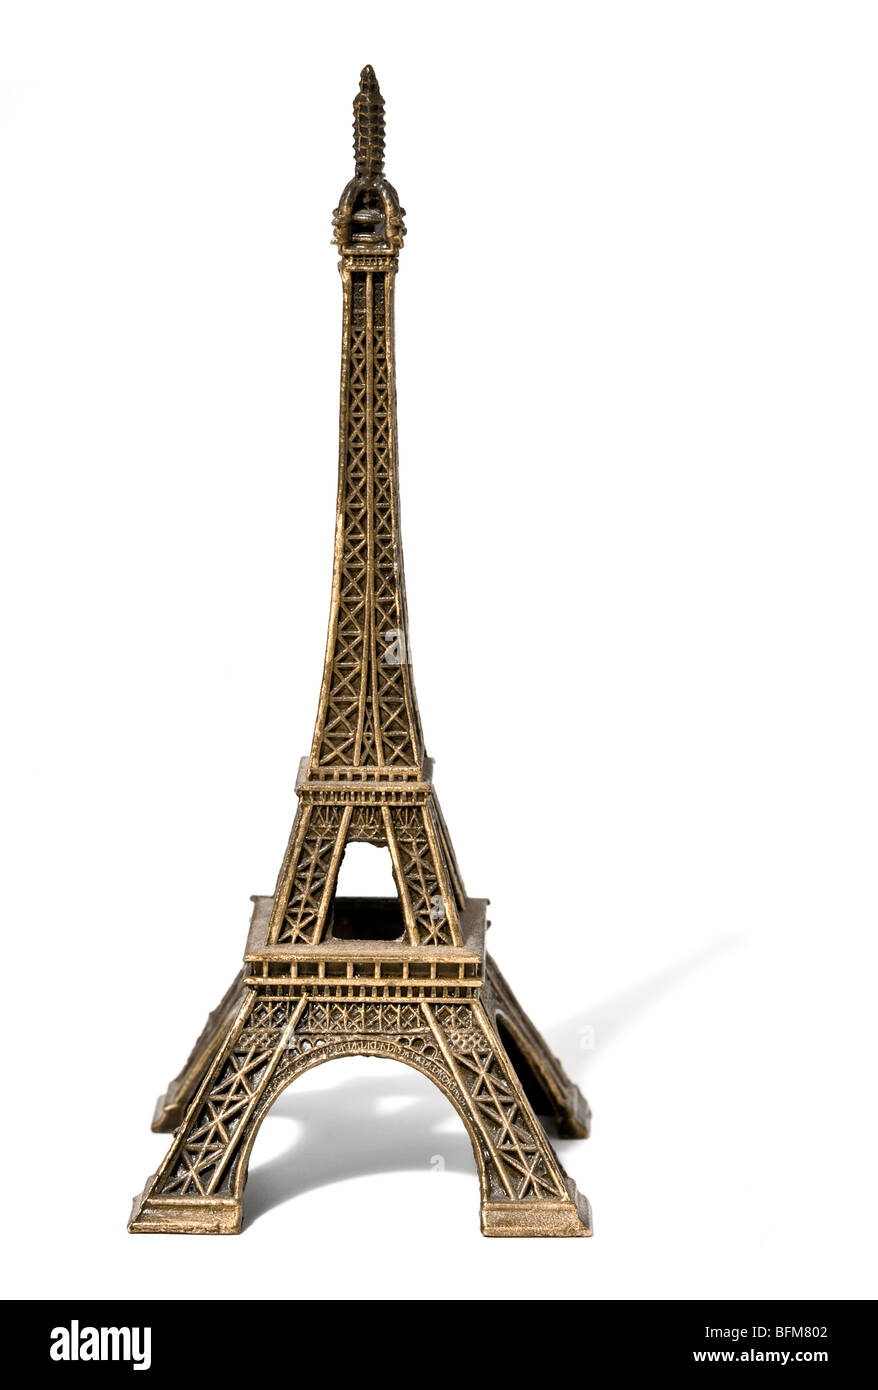 Souvenir model of the Eiffel Tower - Stock Image